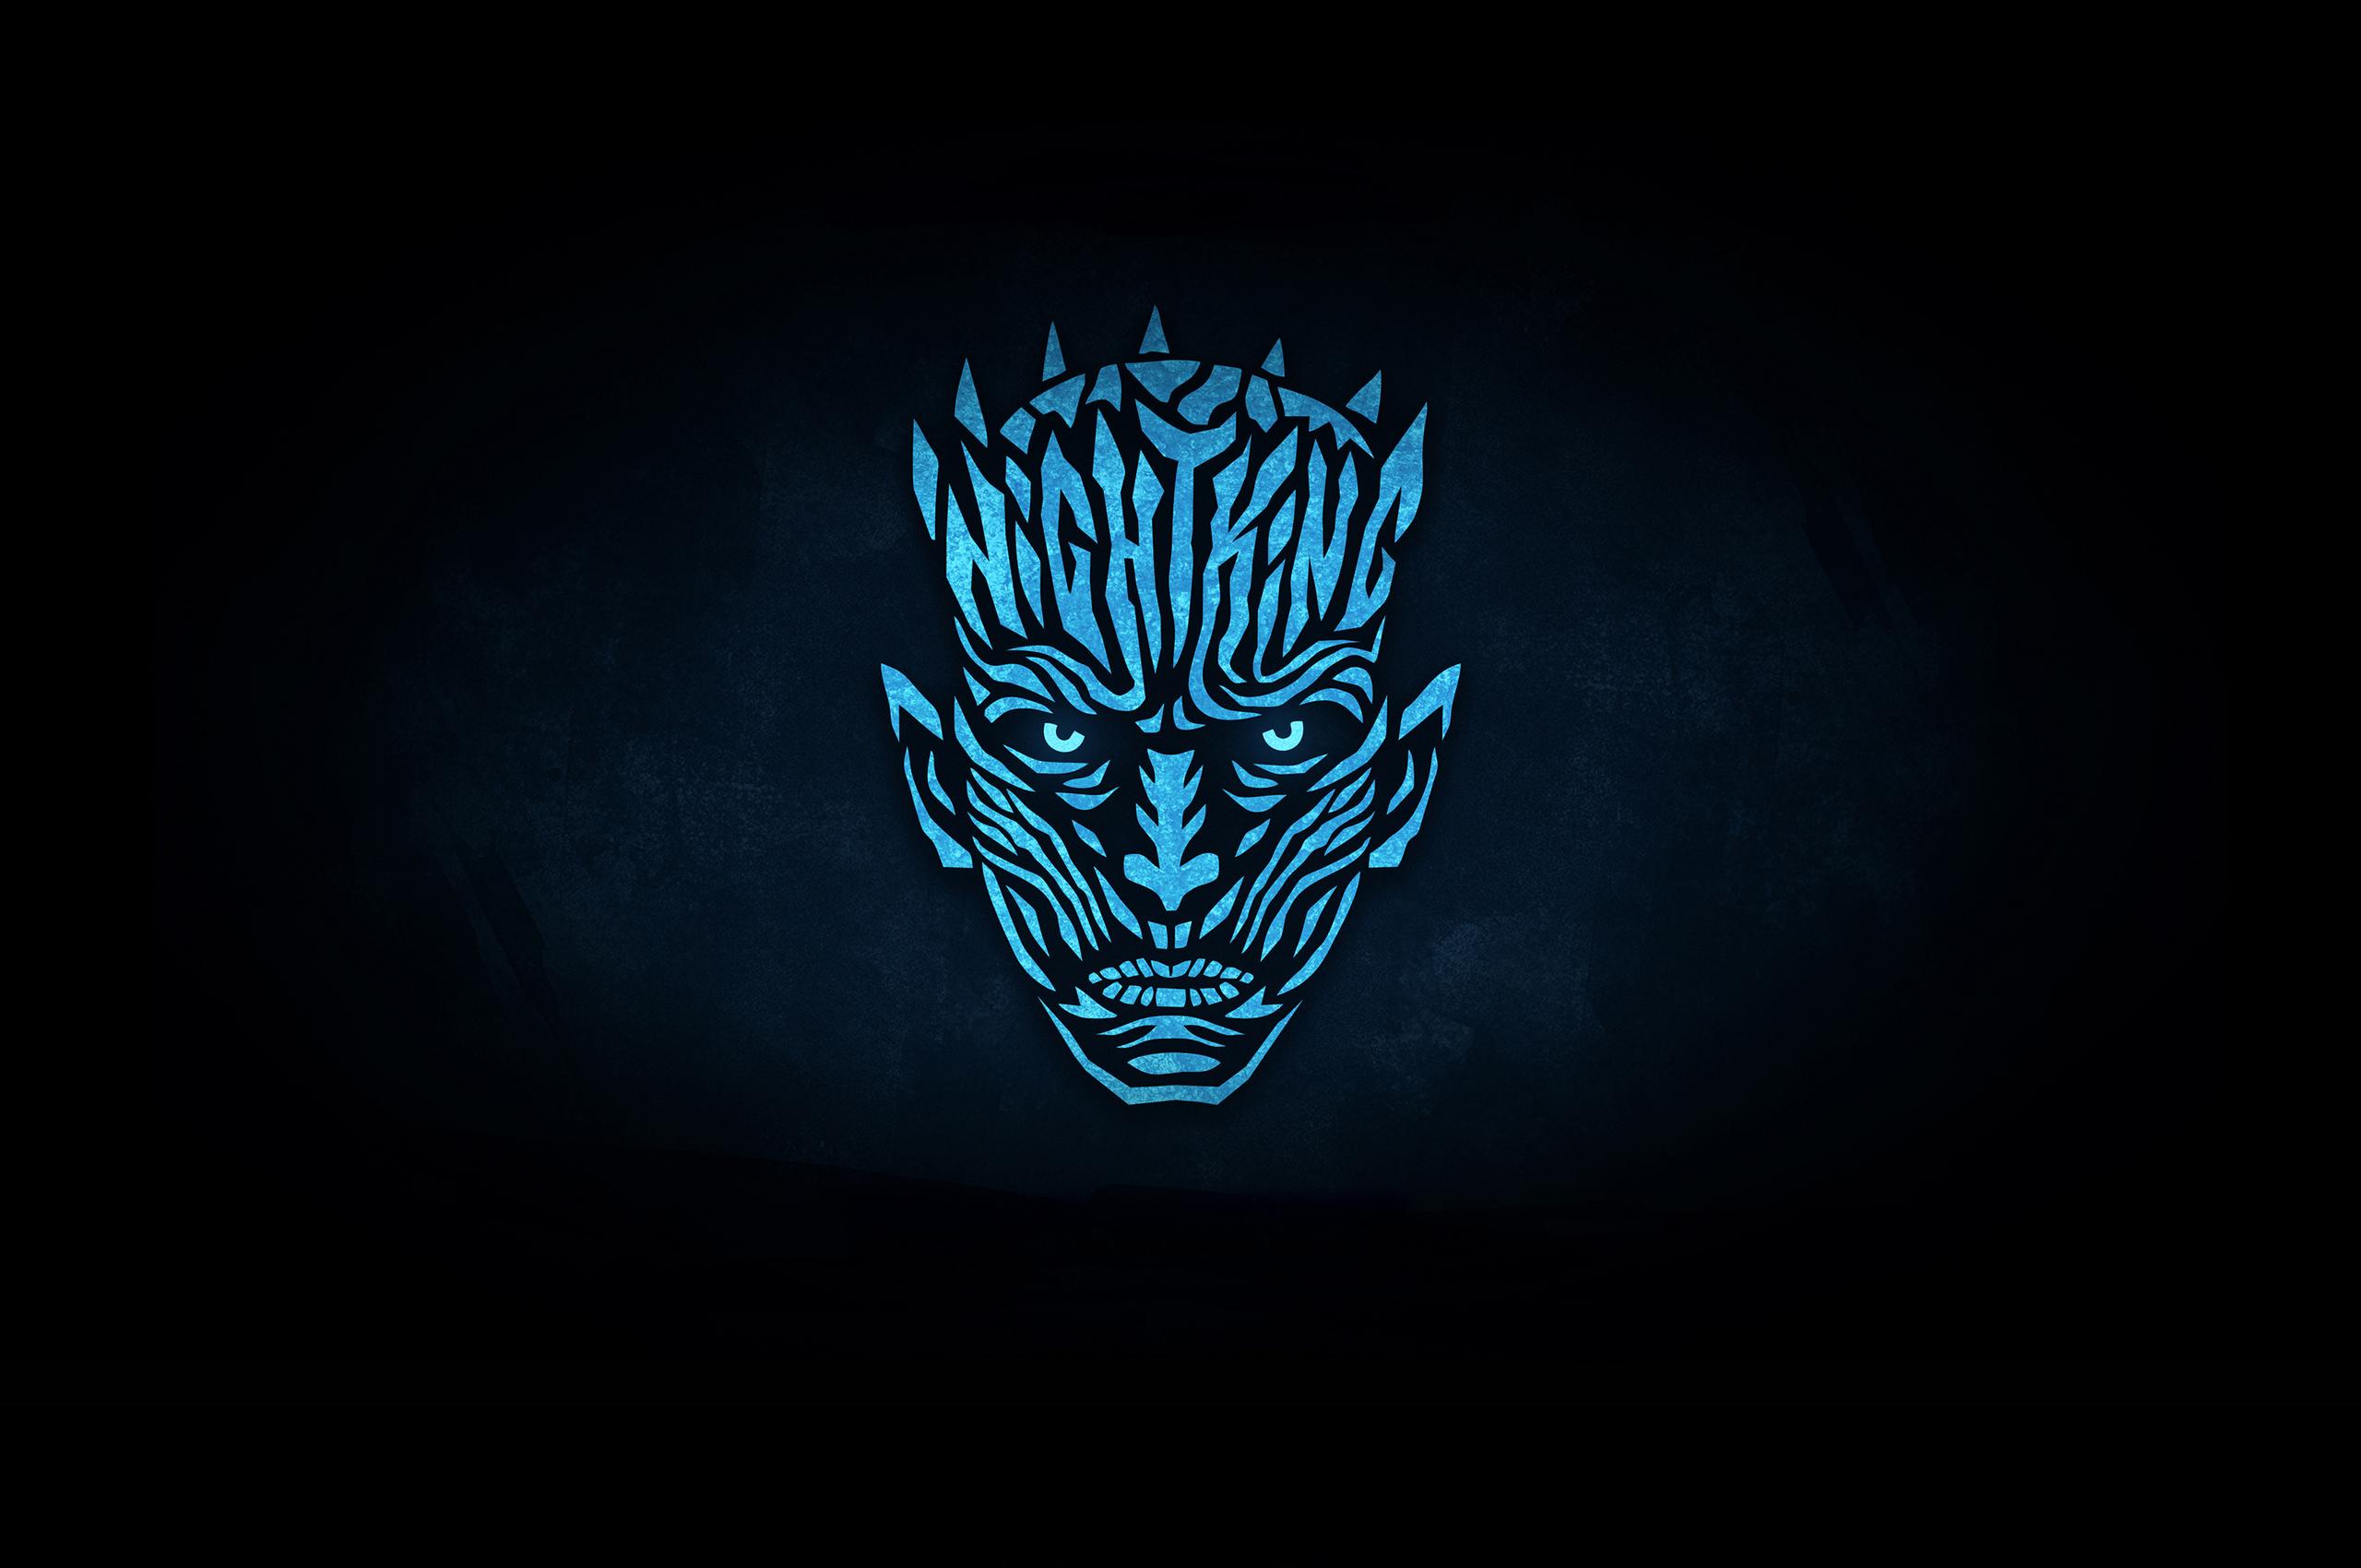 night-king-minimalist-logo-4k-cj.jpg